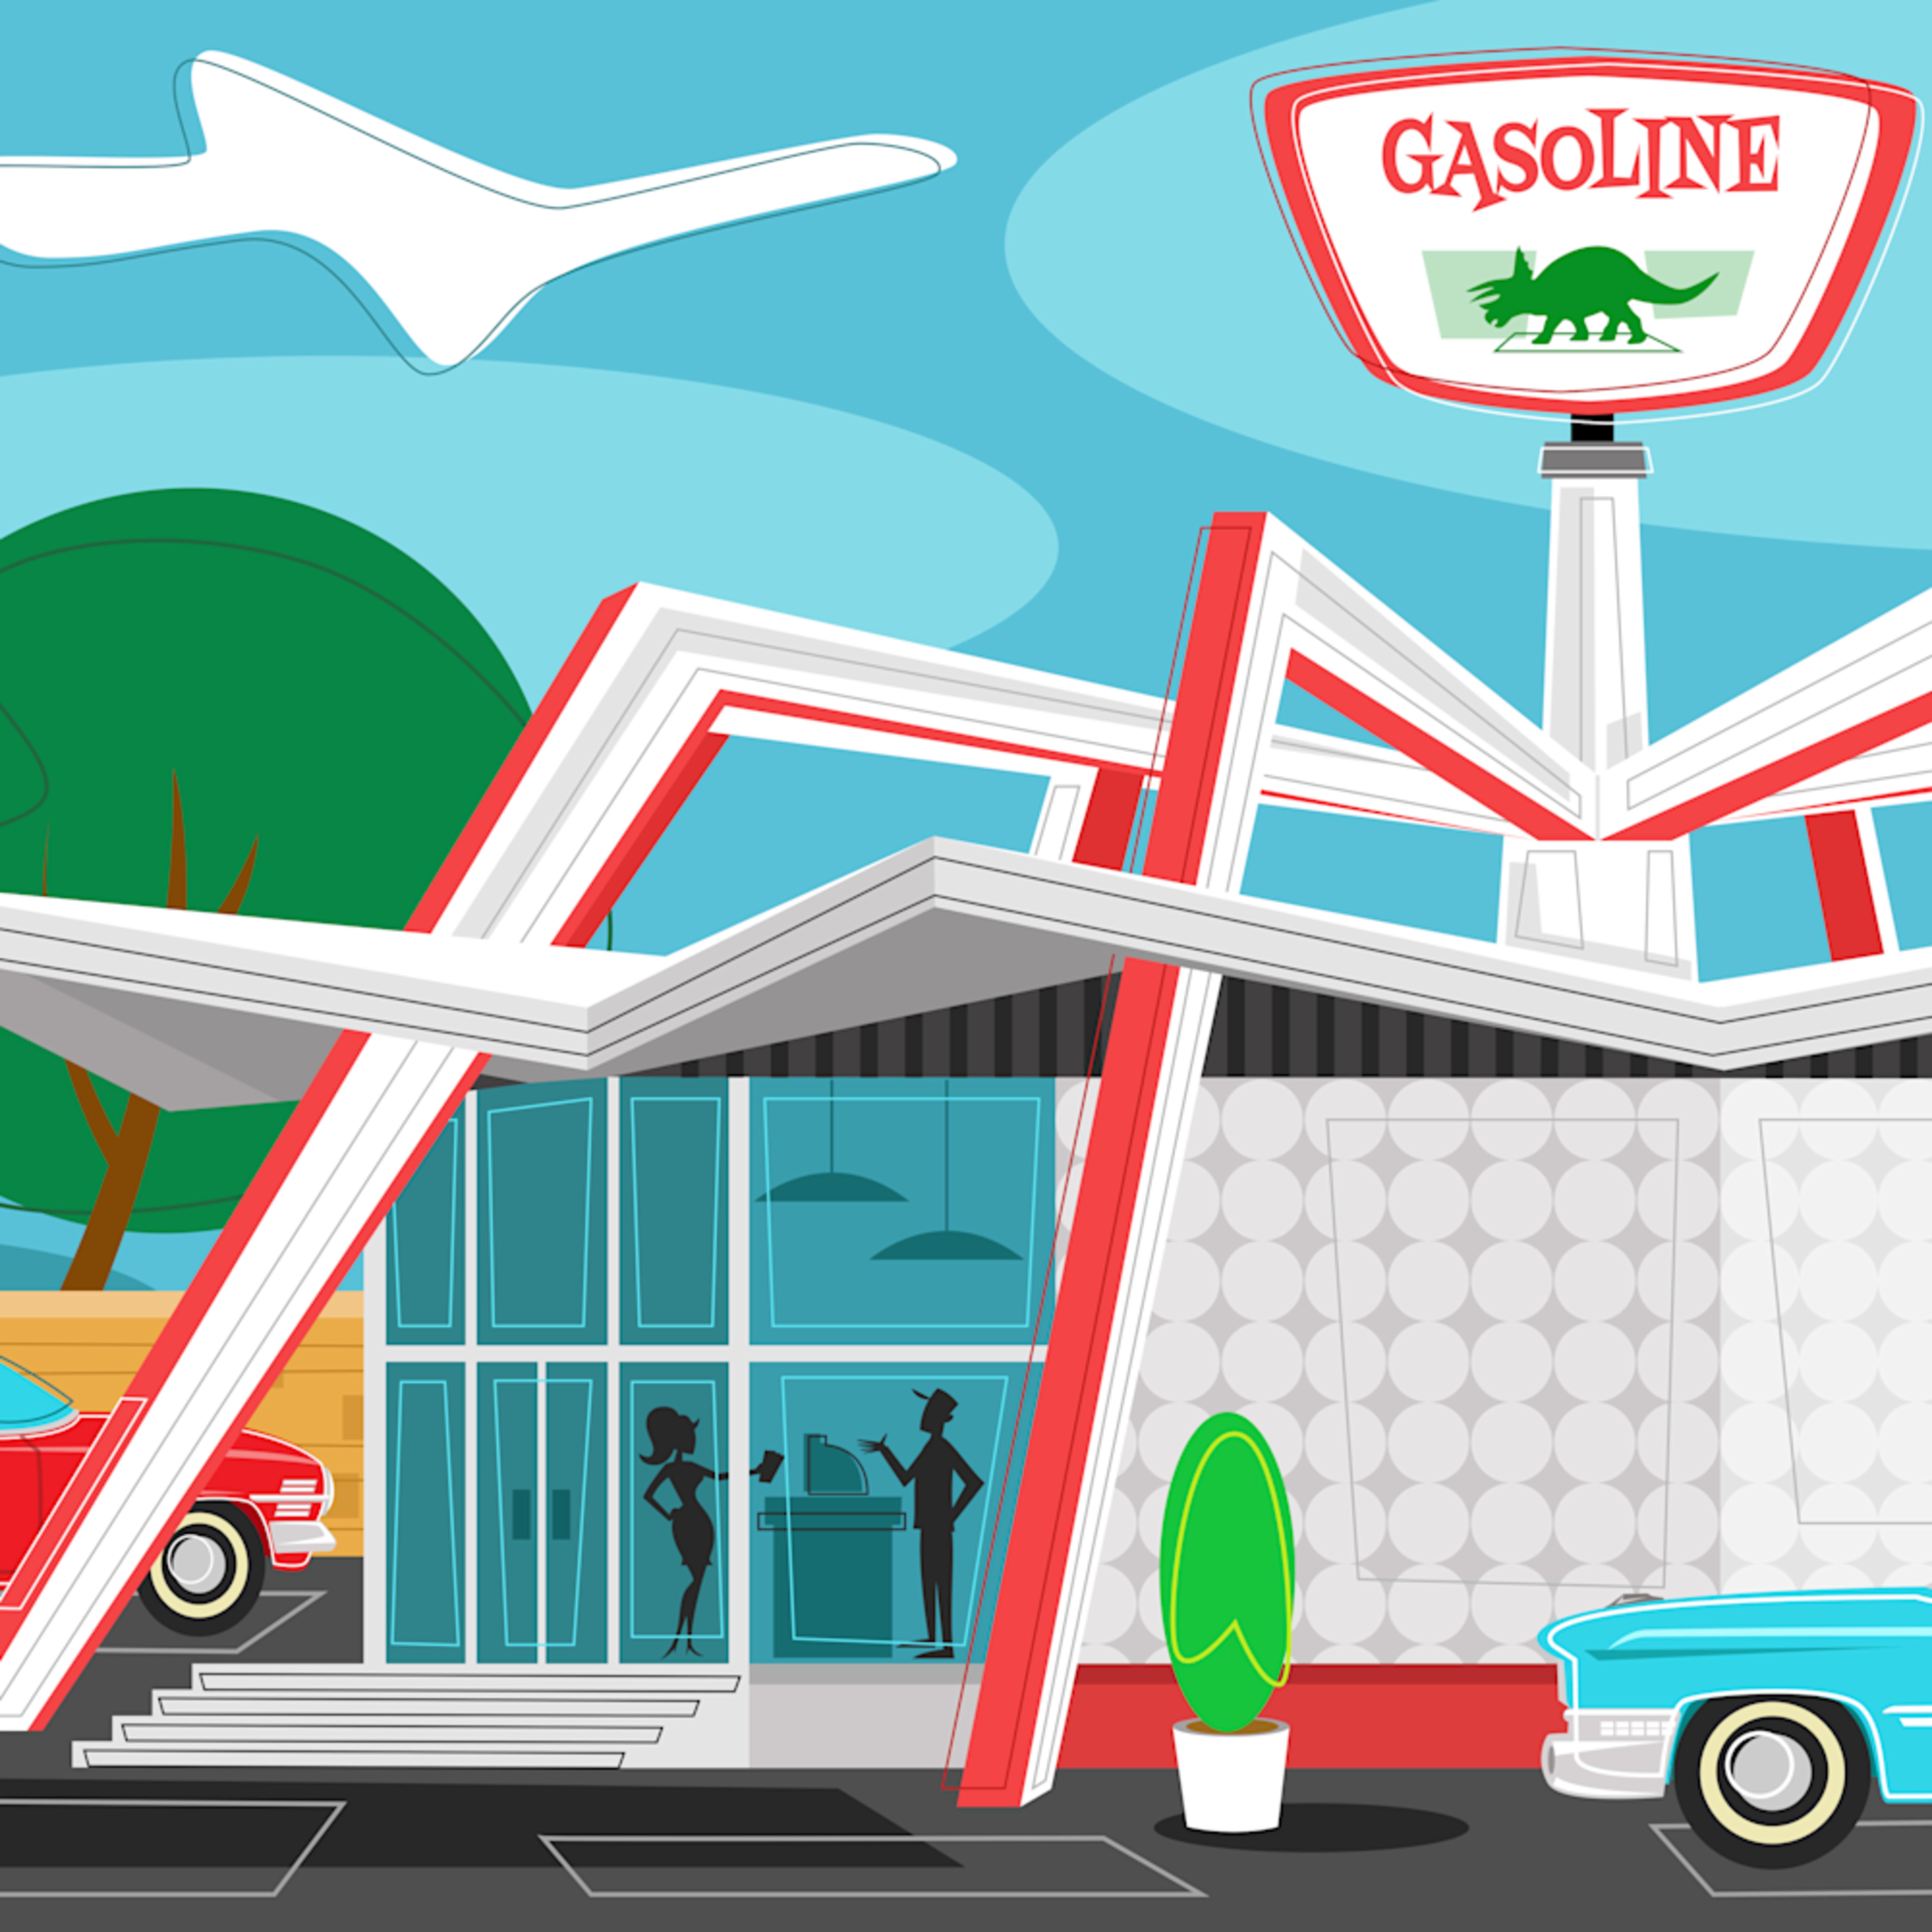 Gas station gnadtf